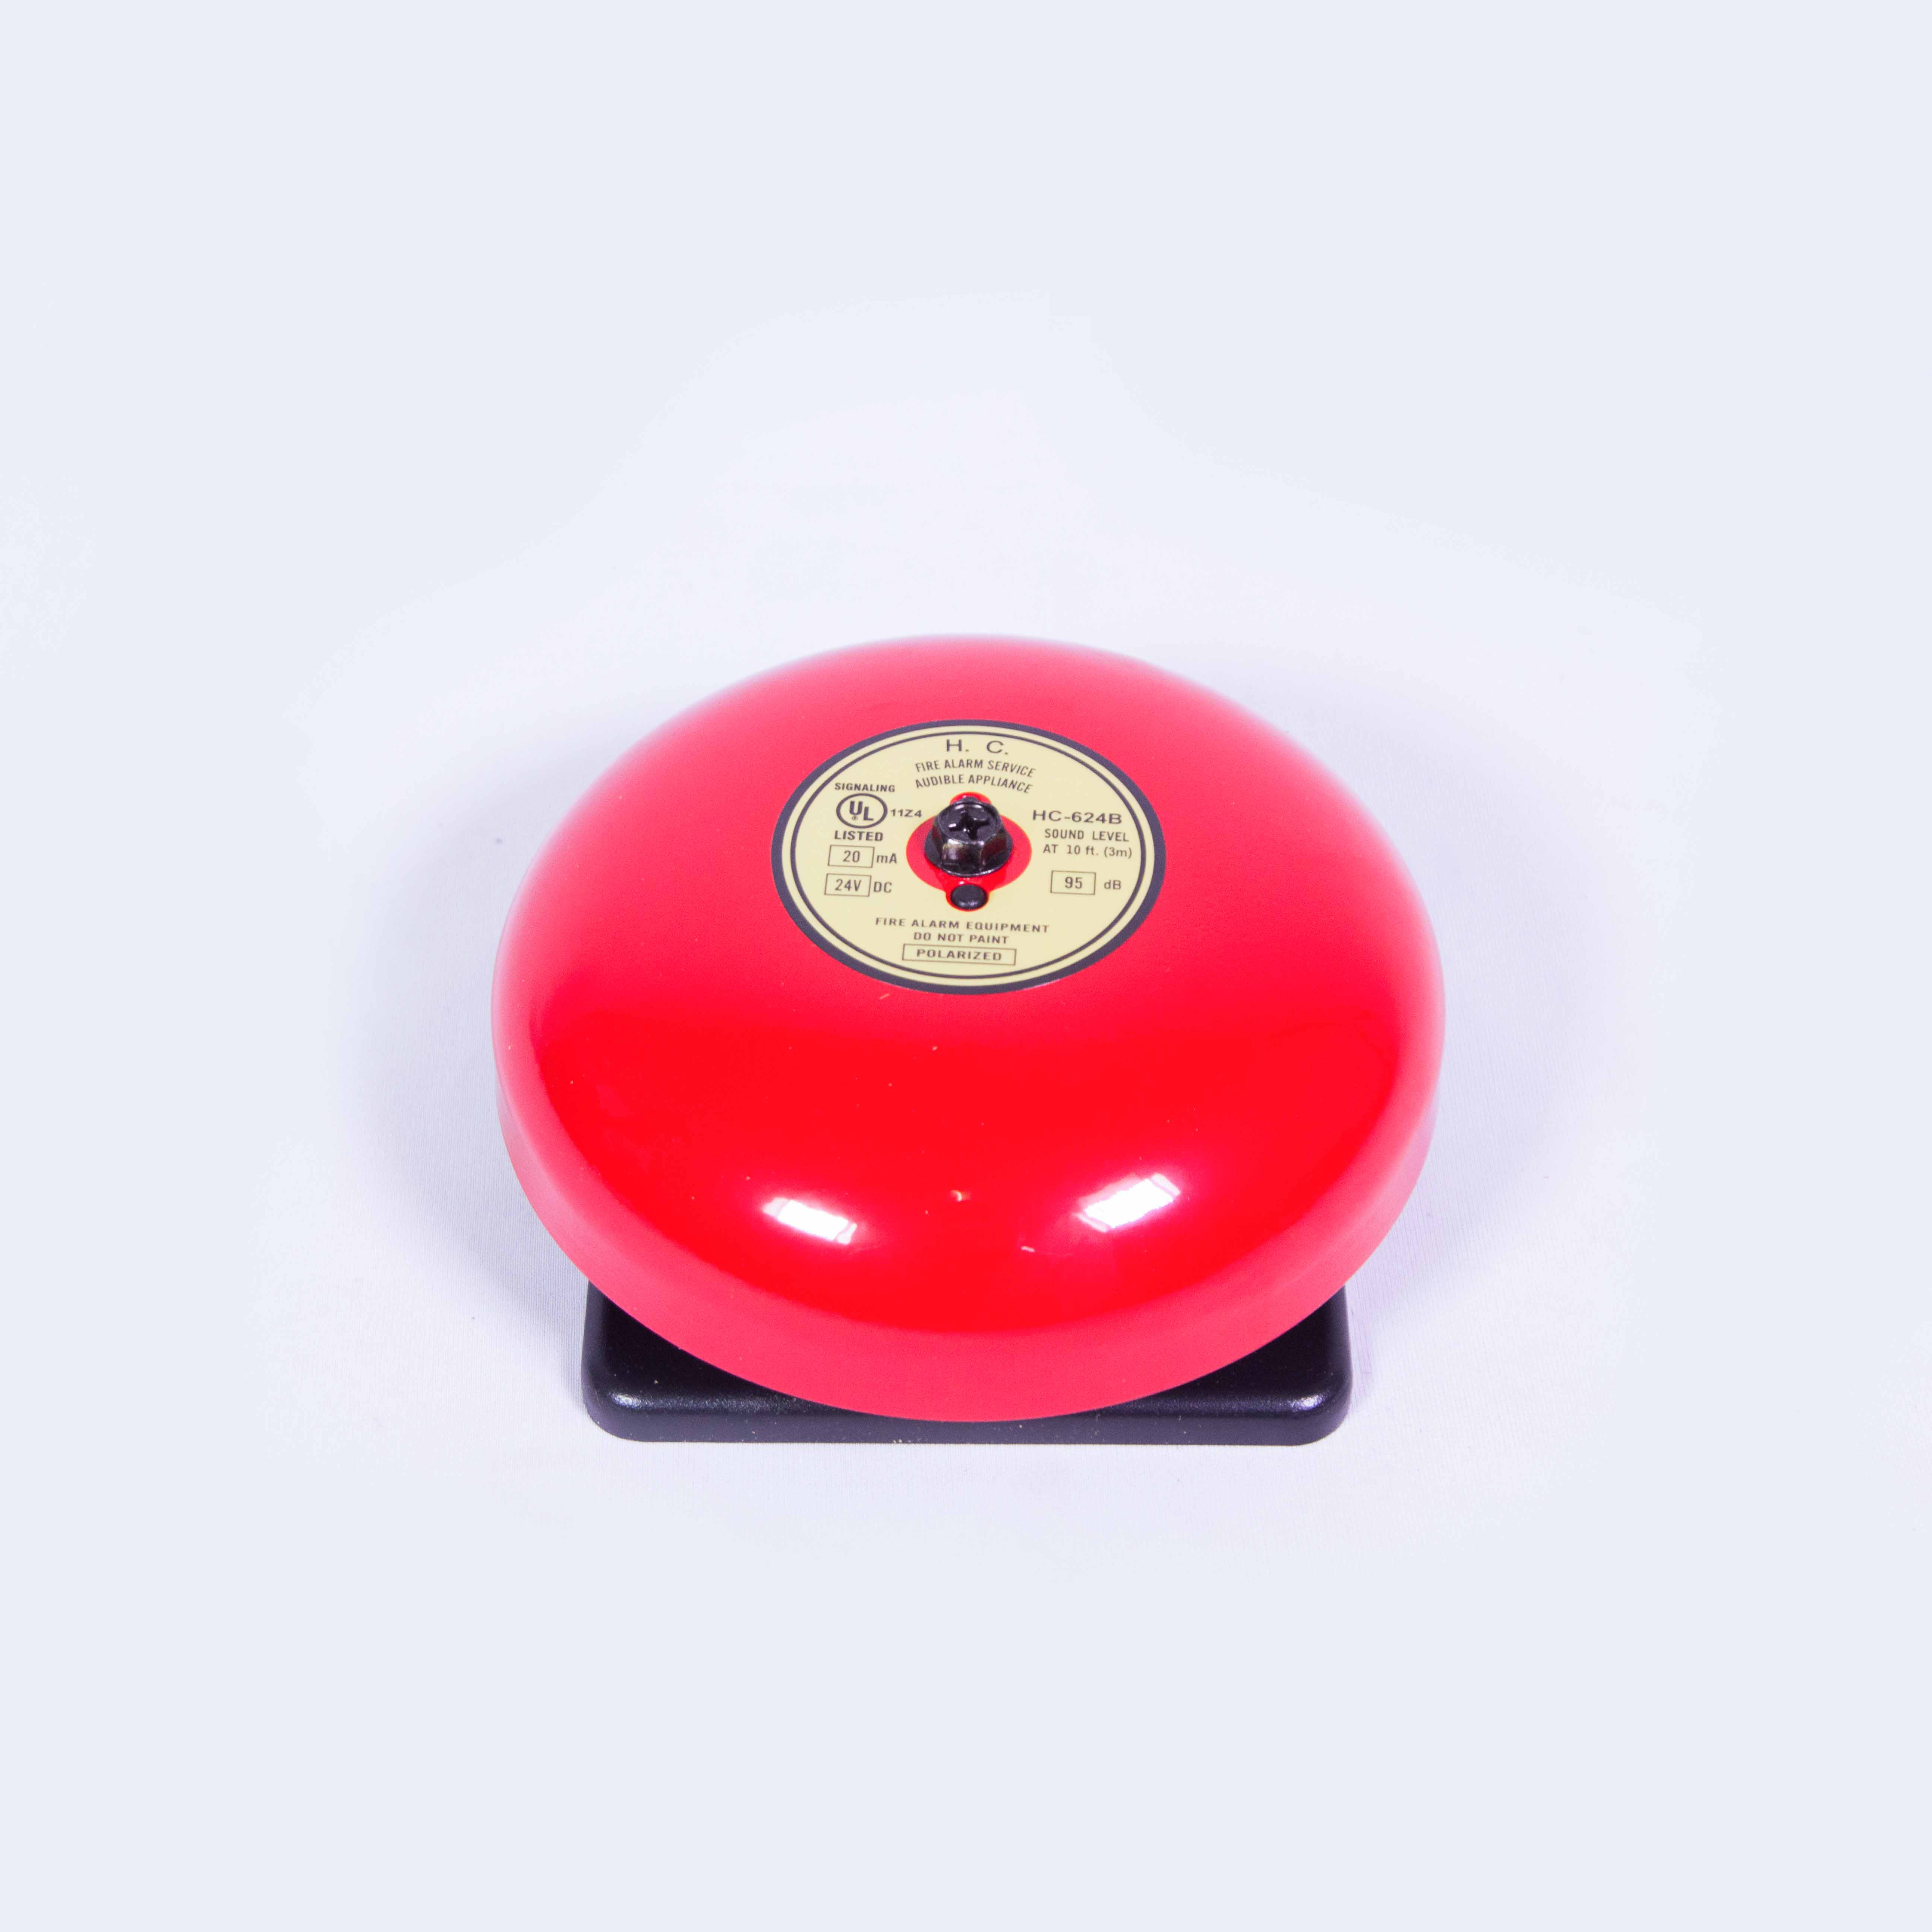 HC 624 Alarm Bell